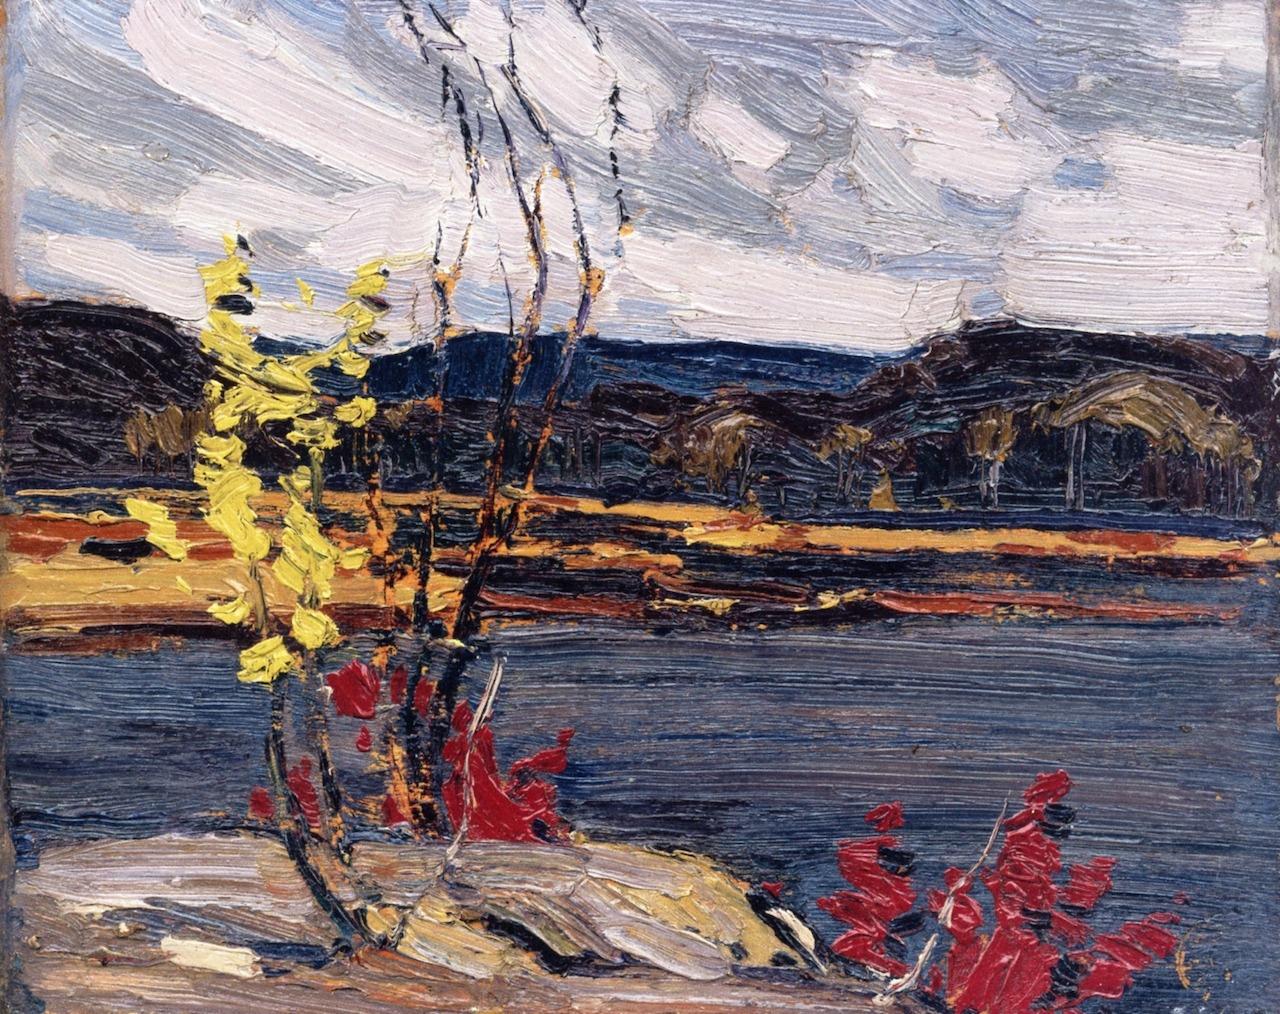 artishardgr:  Tom Thomson - Autumn, Algonquin Park 1916